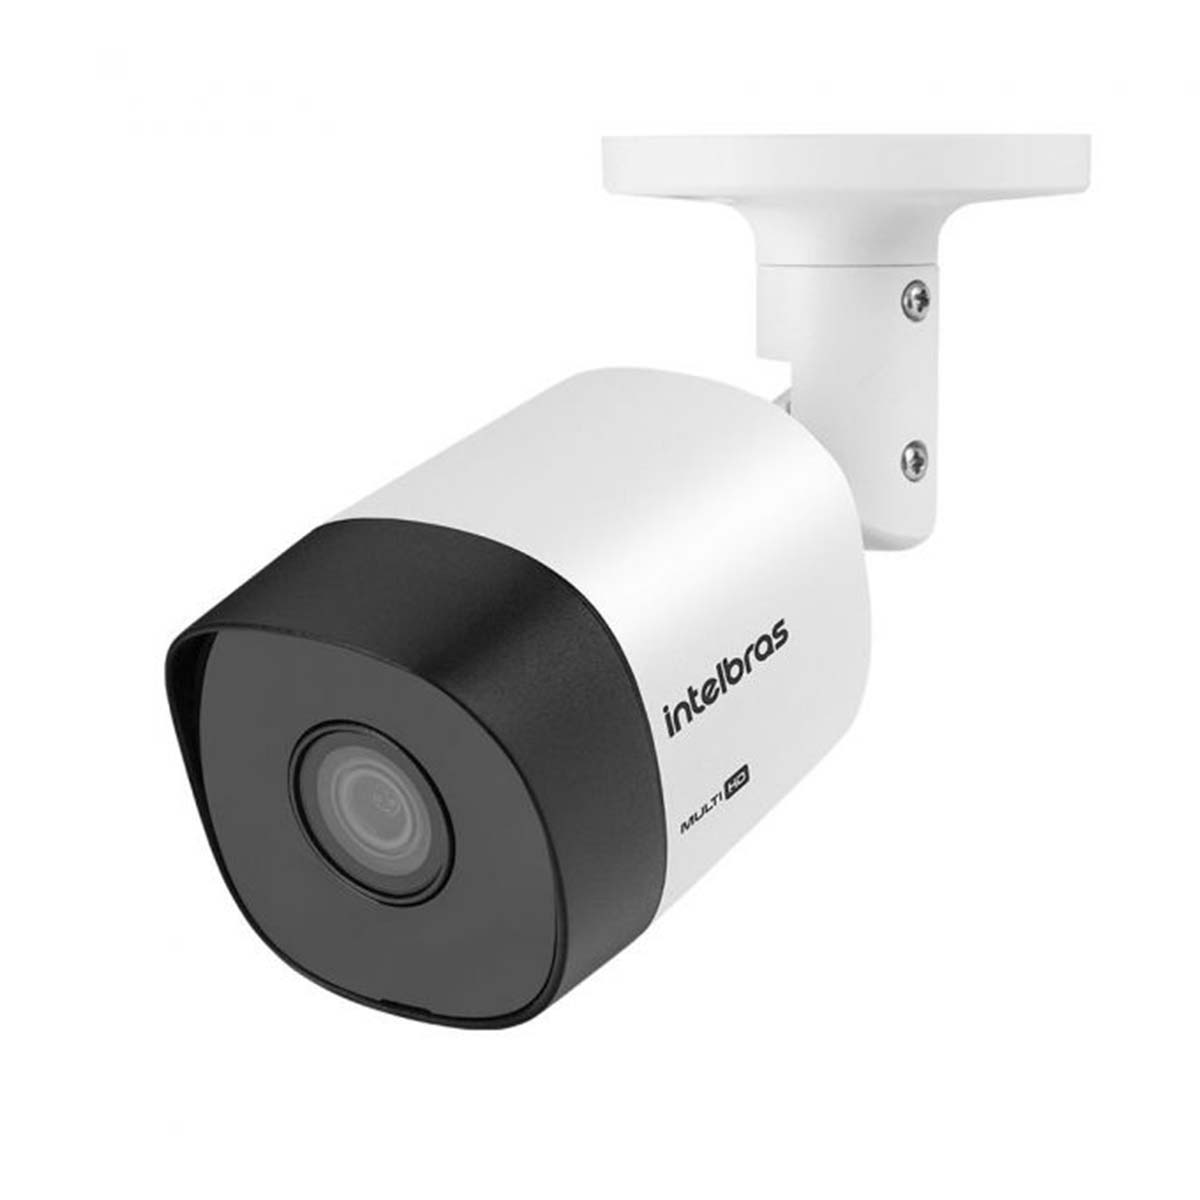 Kit 03 Câmera Bullet Intelbras Vhd 3130 B G6 720p 3,6mm